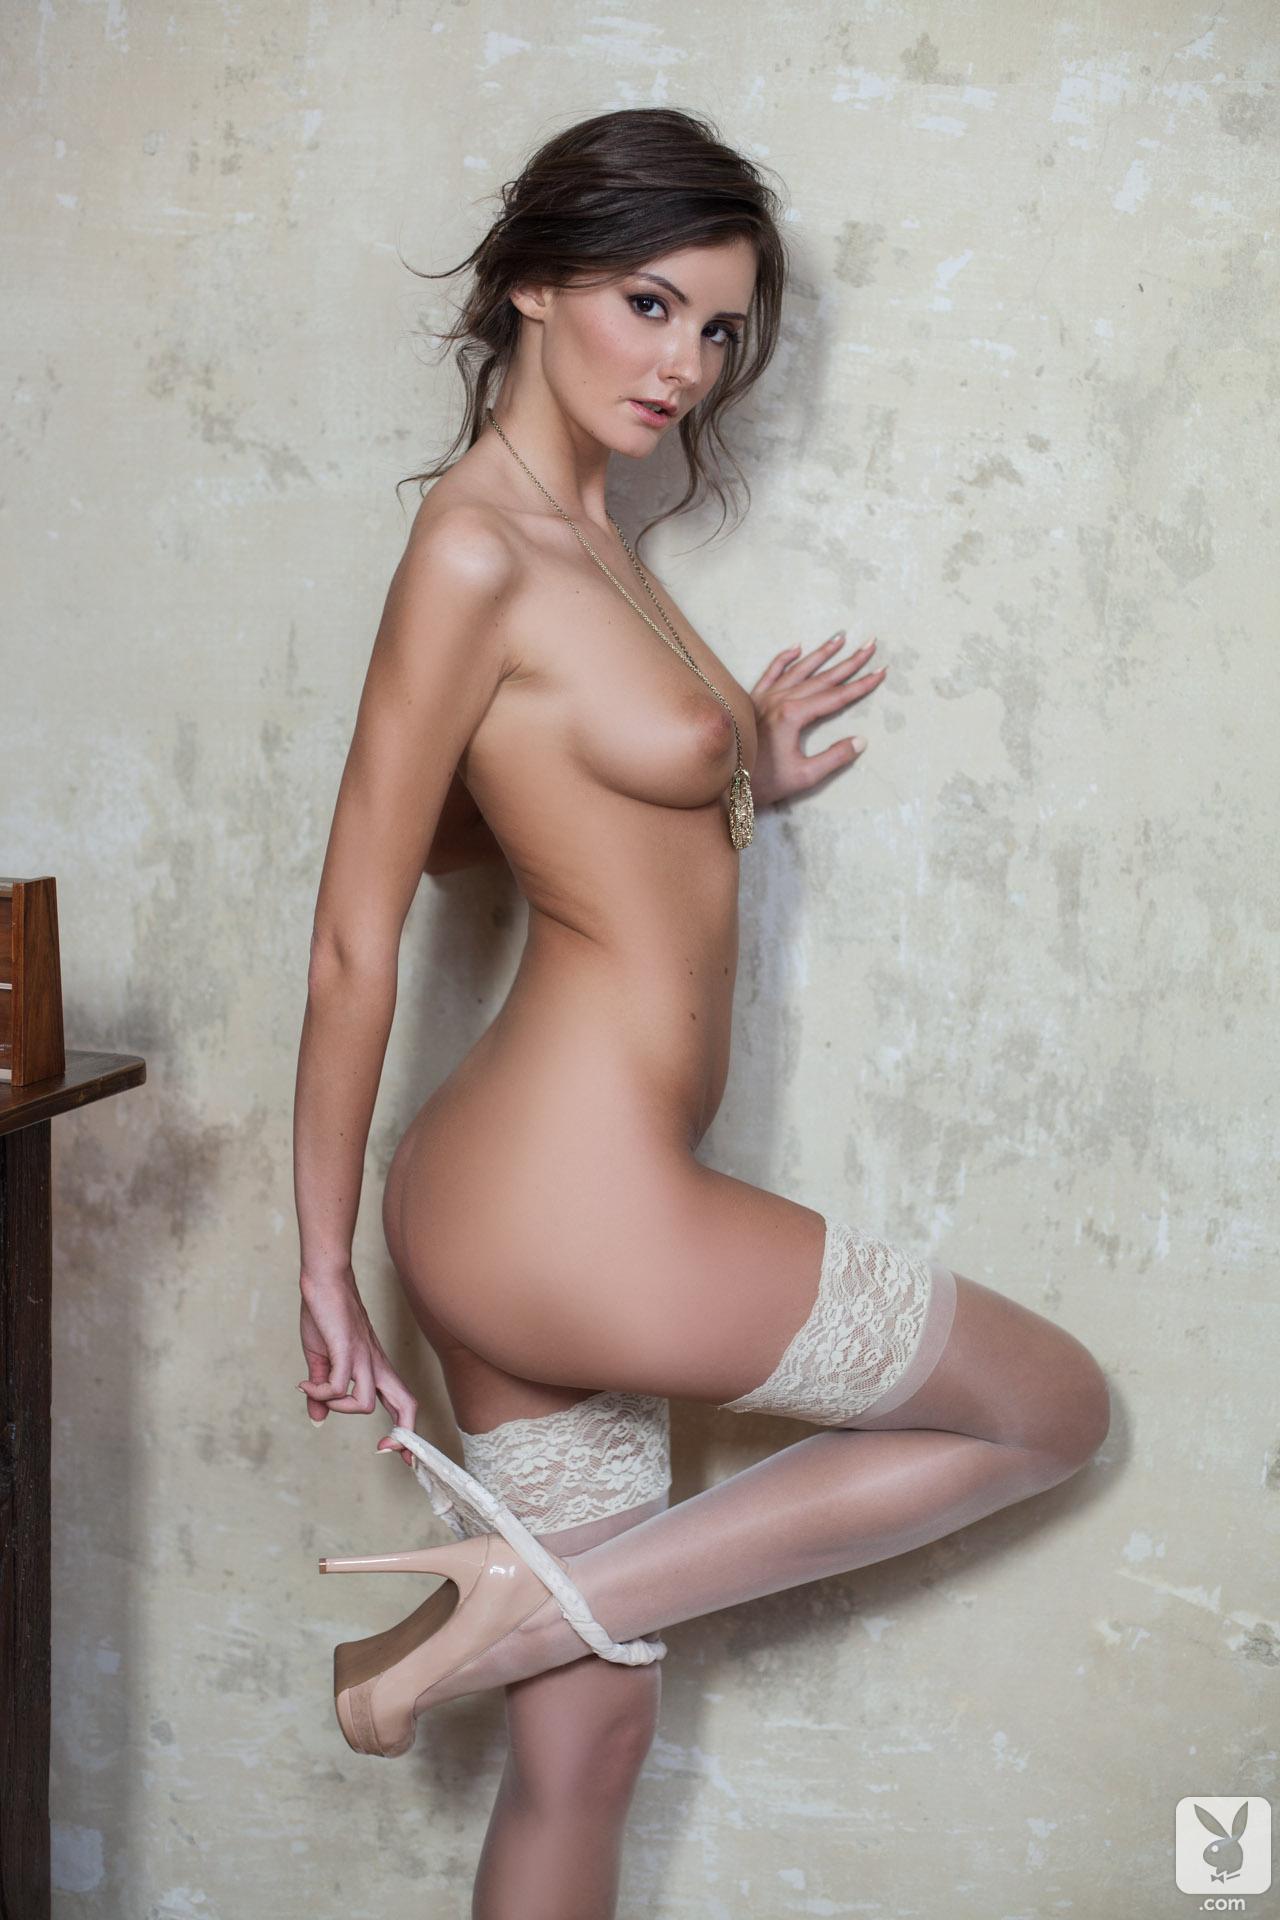 real-nina-dobrev-naked-naked-perfect-body-chick